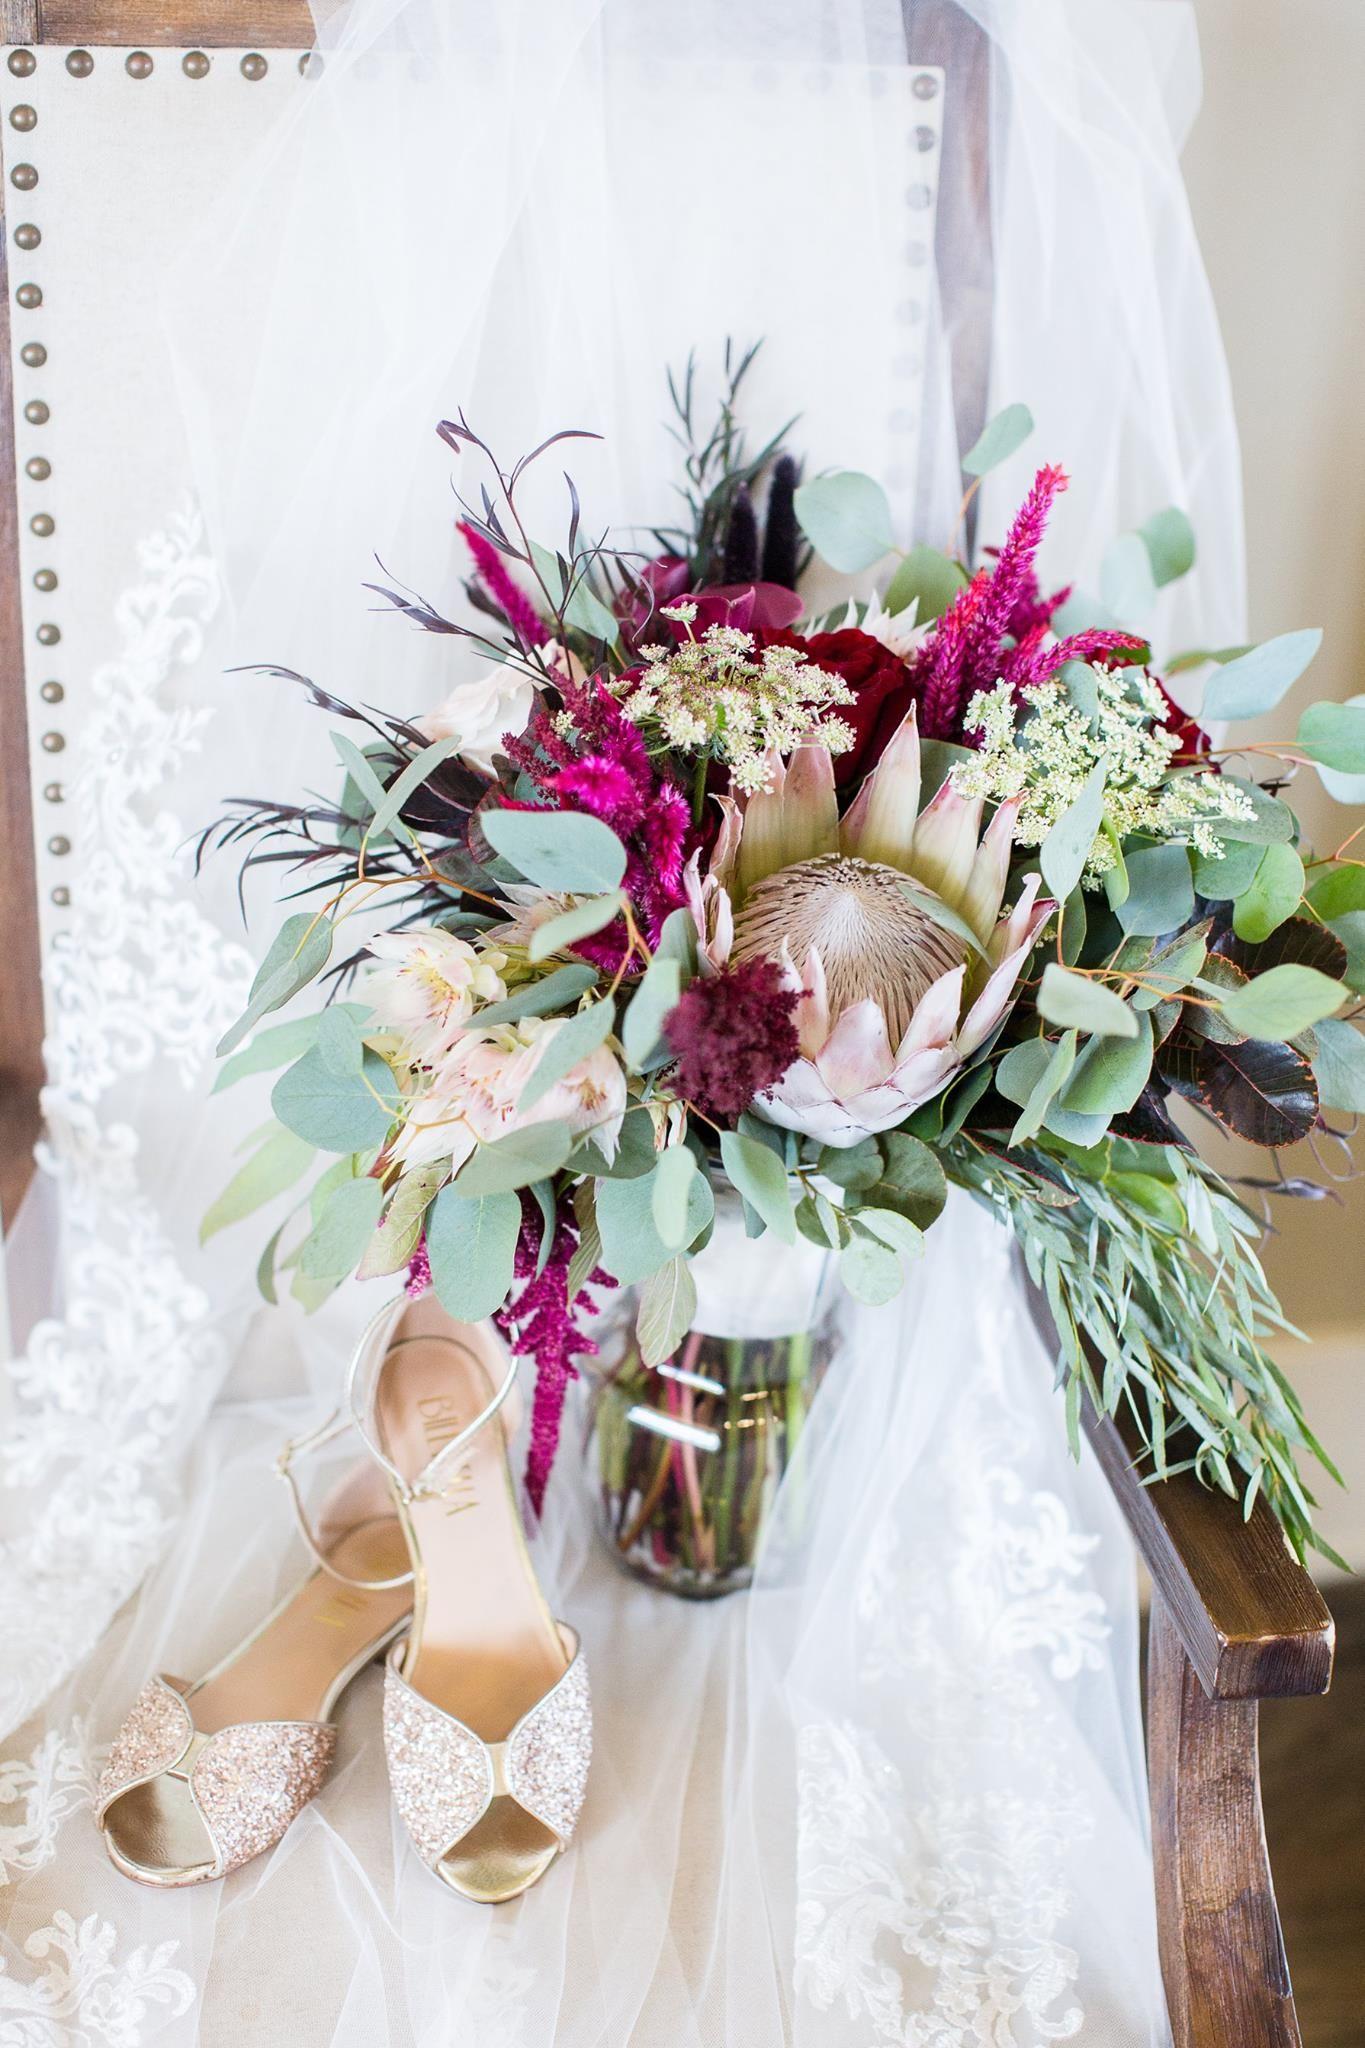 Artistic bridal bouquet featuring protea, calla lilies